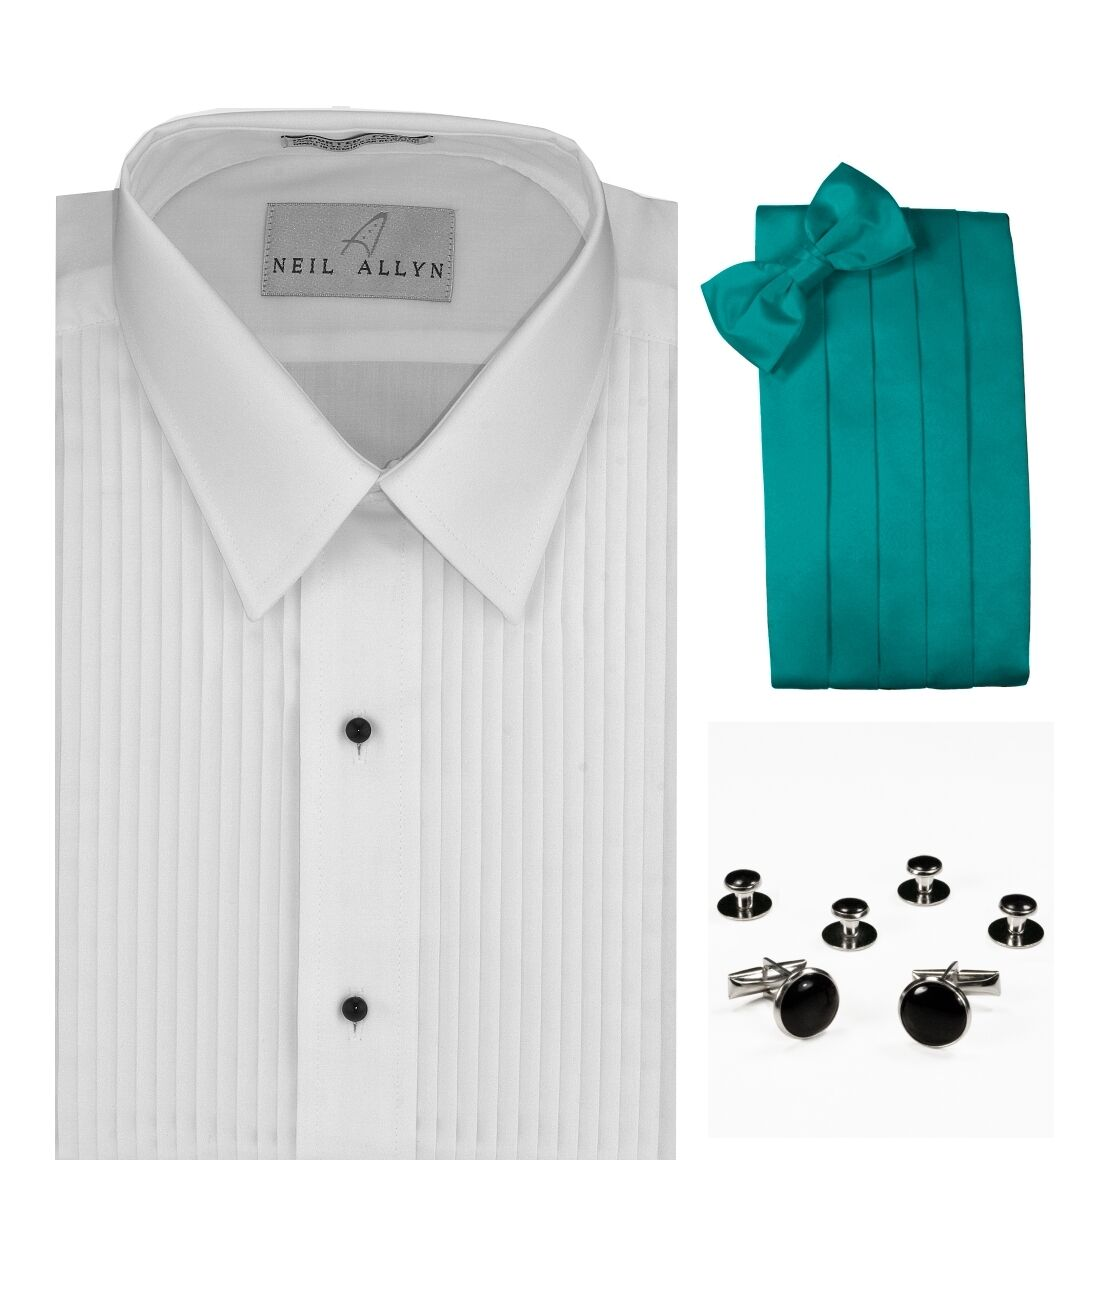 Tuxedo Shirt, Teal Cummerbund, Bow-Tie, Cuff Links & Studs